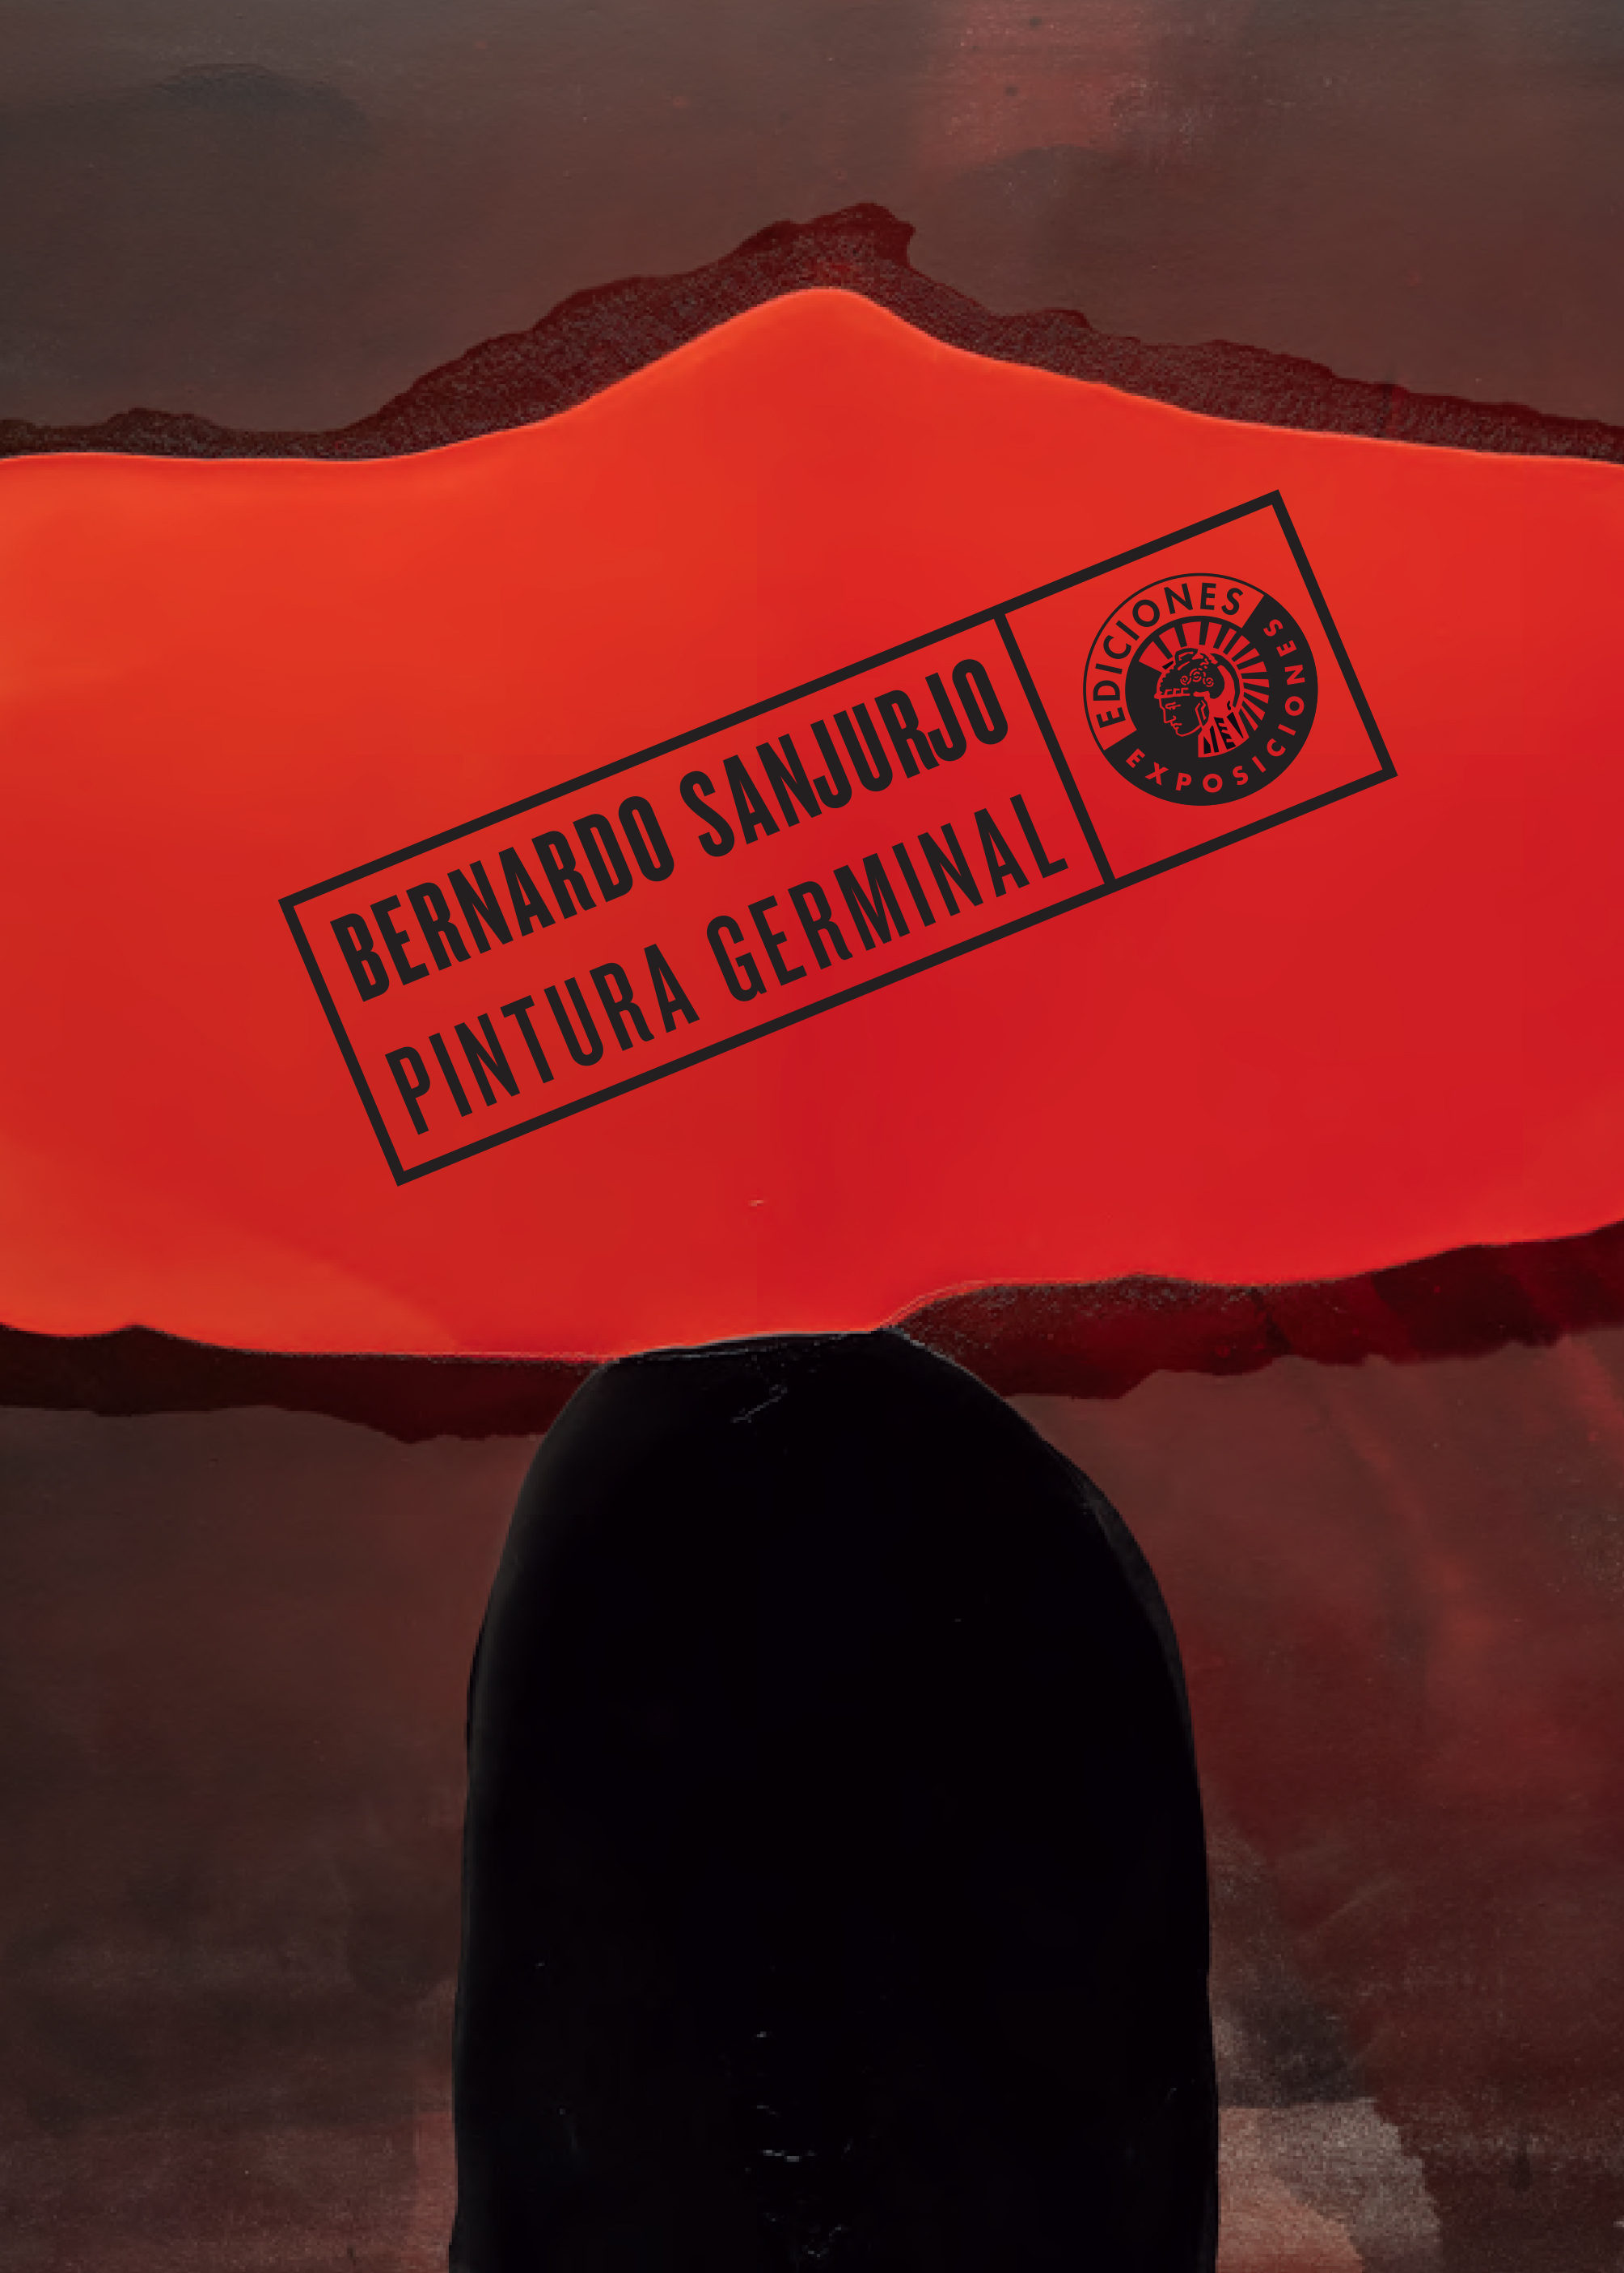 Pintura Germinal - Sanjurjo Bernardo